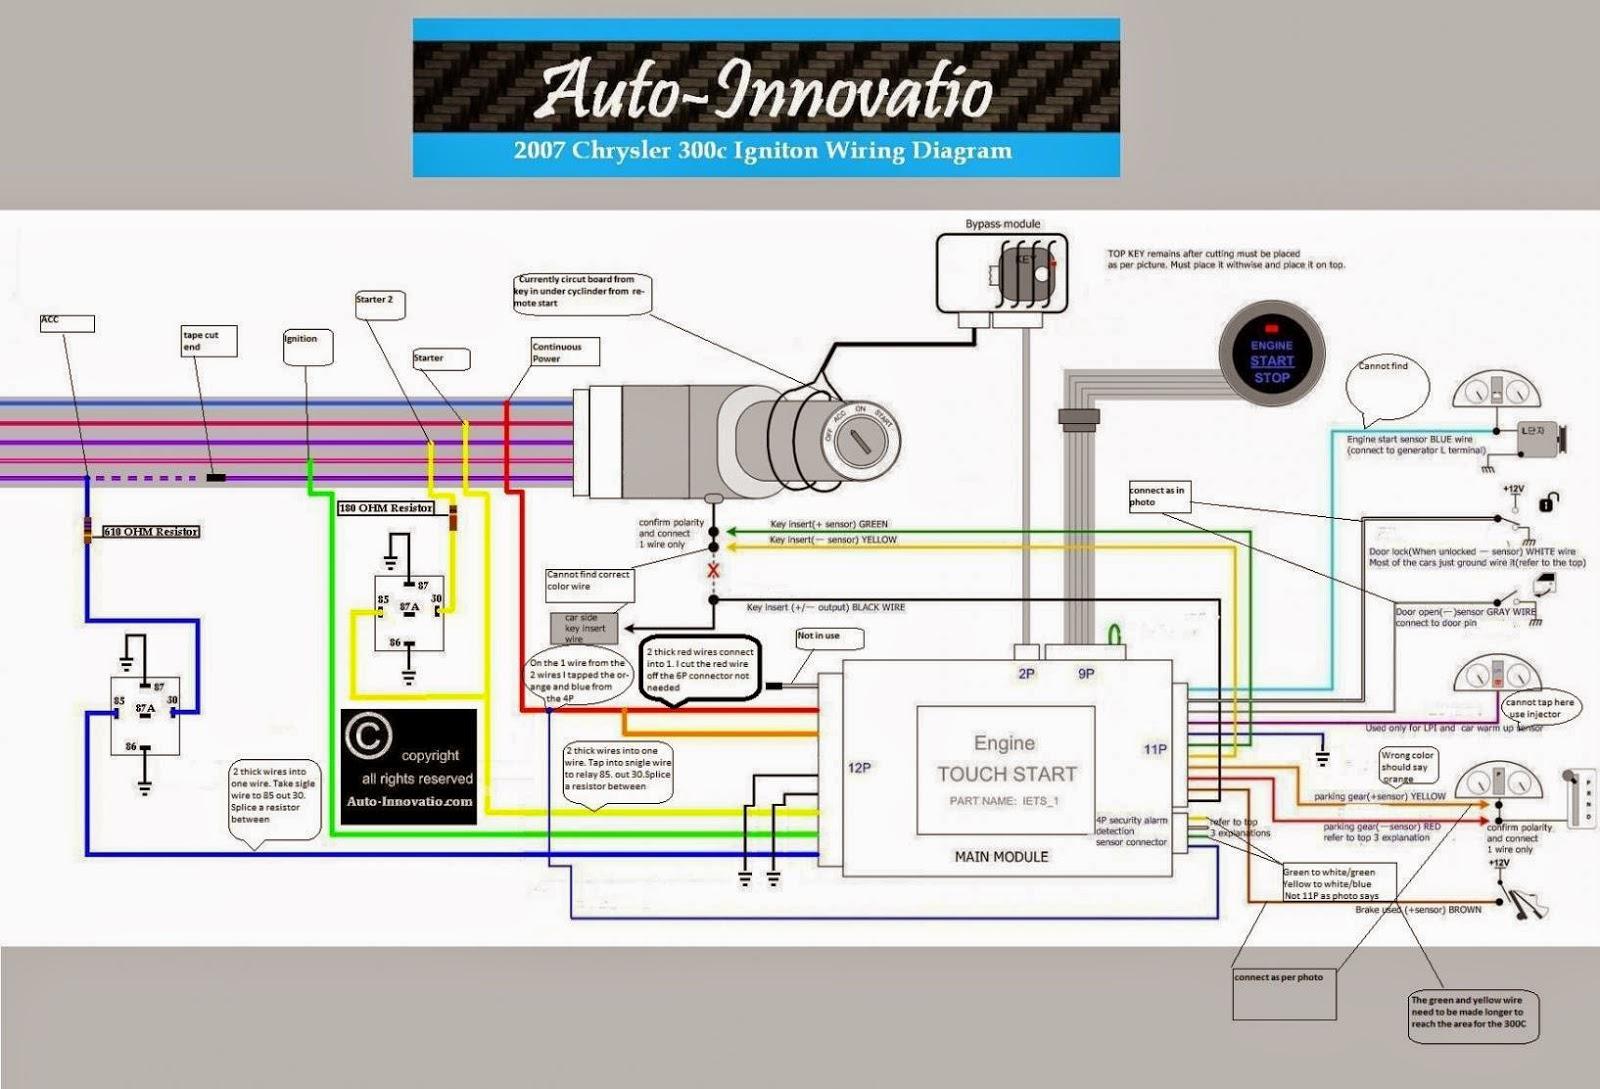 Saab 95 Wiring Diagram Free Diy Enthusiasts Diagrams 9 5 Stereo Smart 2005 Fuse Electrical Rh Cytrus Co 1995 900